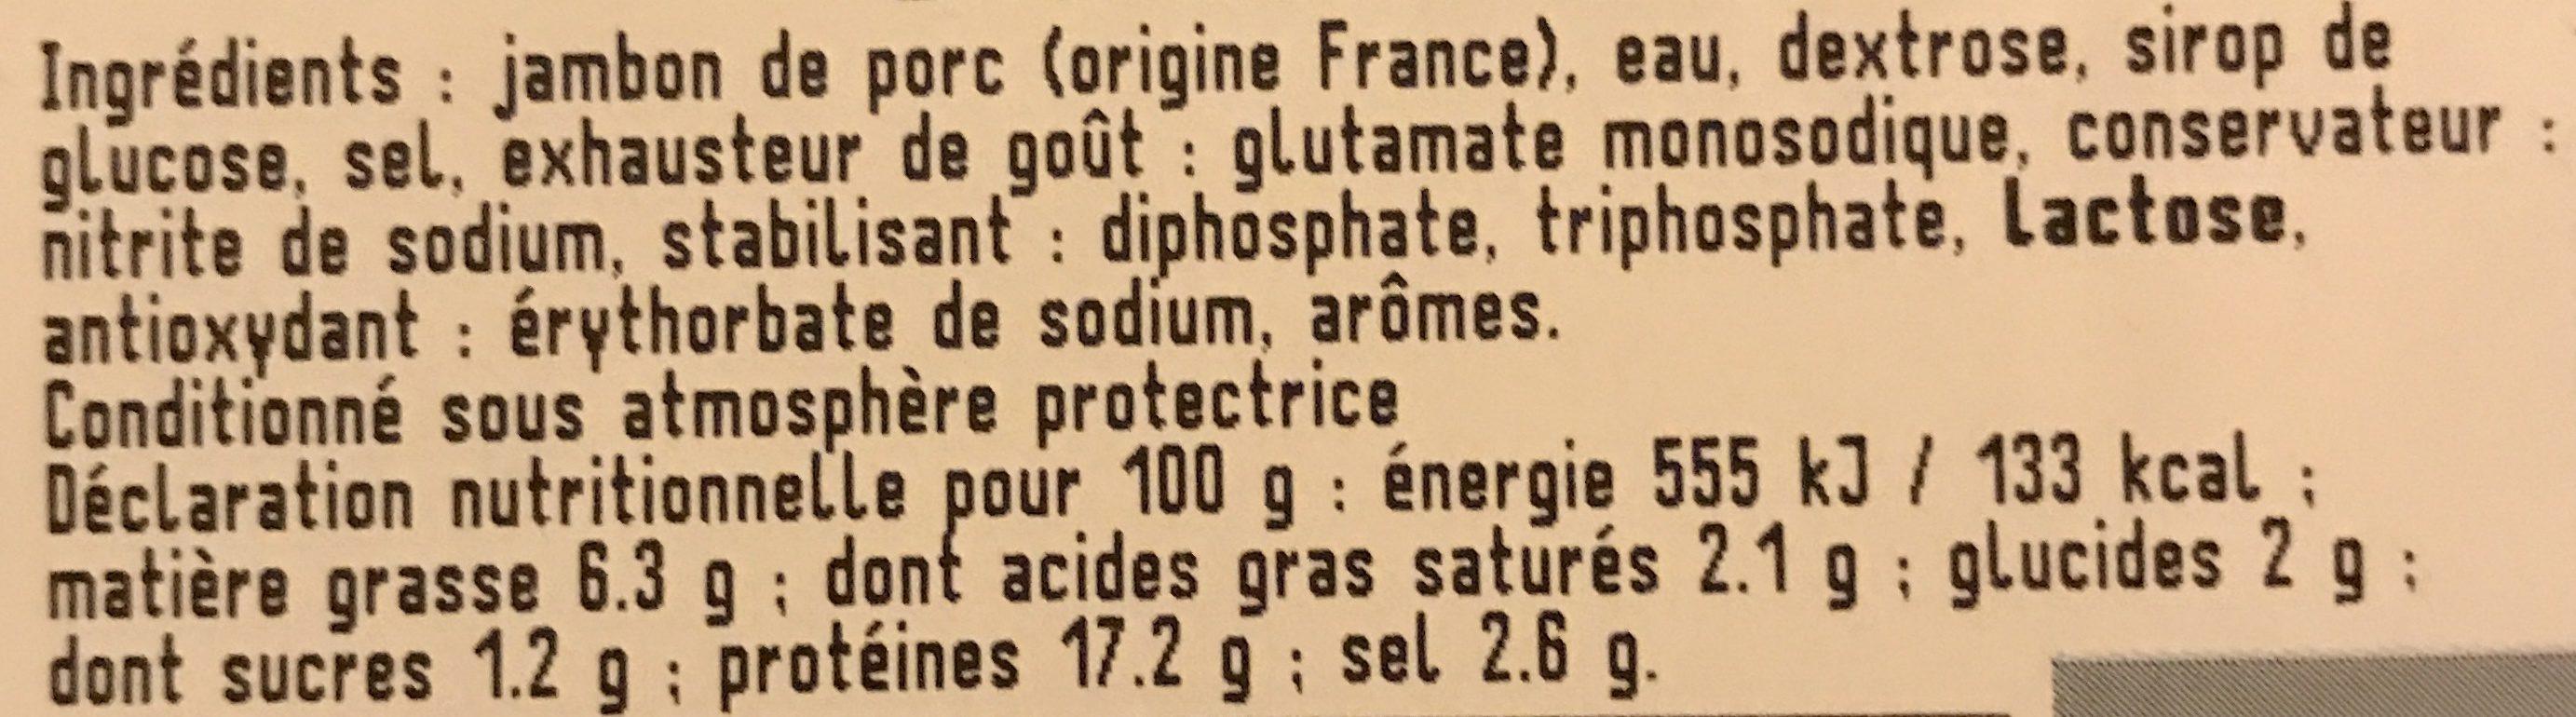 Jambon cuit choix - Ingrediënten - fr